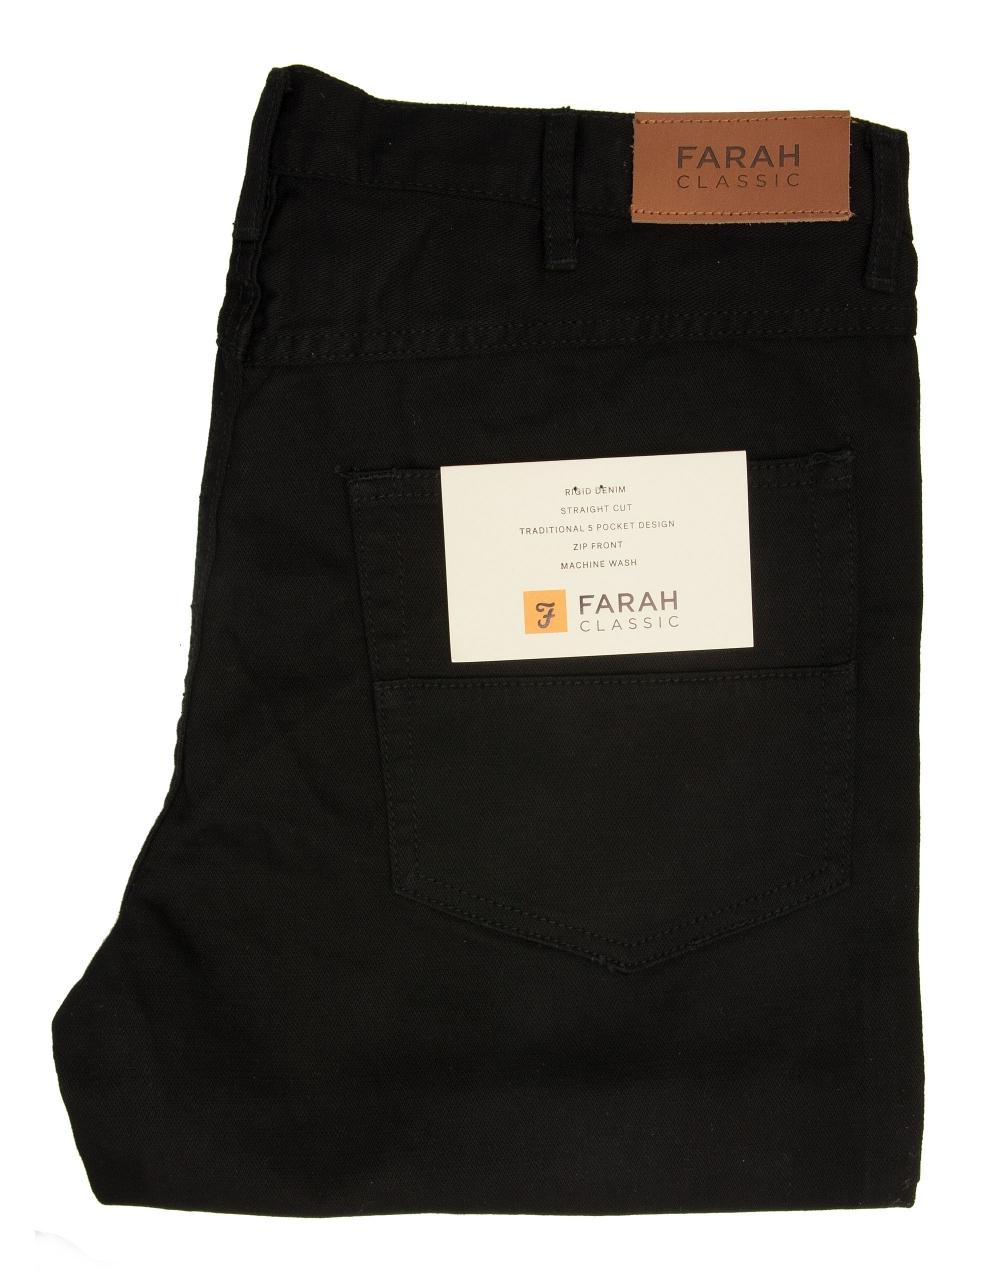 Farah Black Jeans